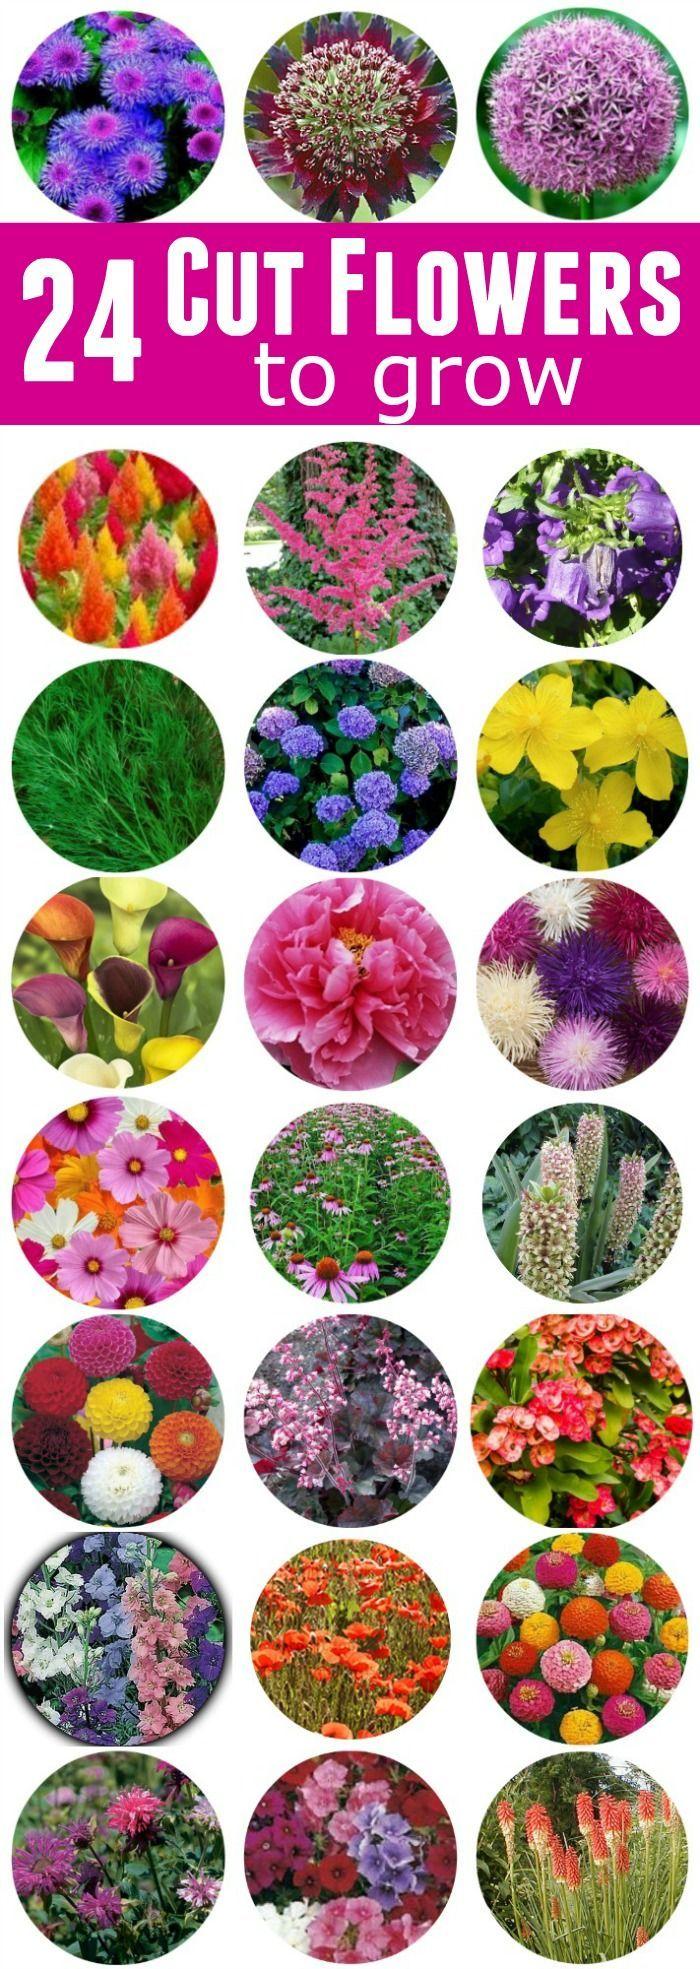 874 Best Gardens U0026 Yards Images On Pinterest | Gardening, Flowers Garden  And Backyard Ideas